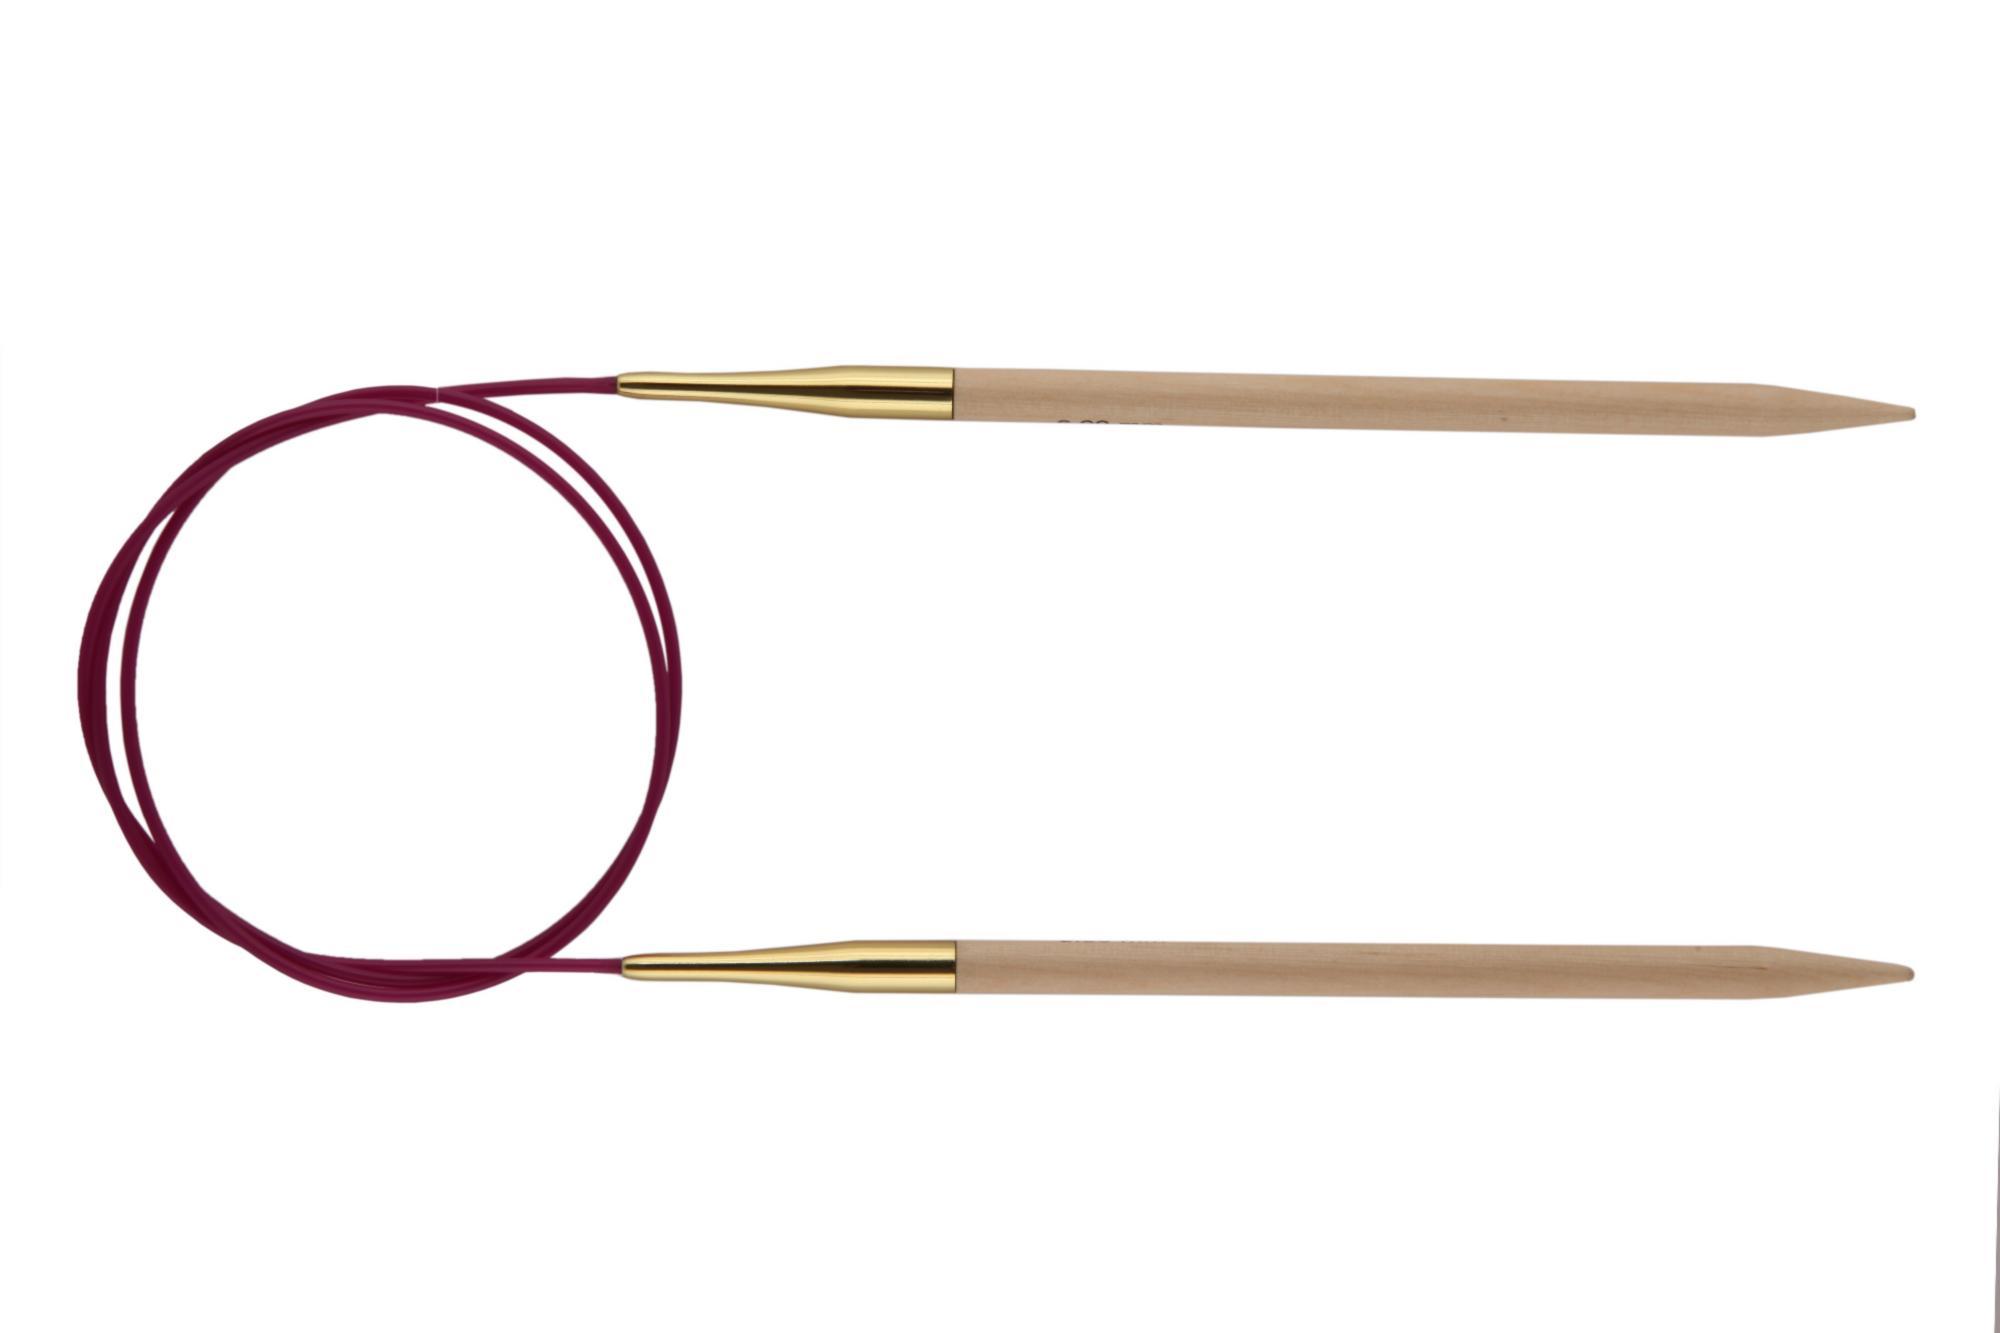 Спицы круговые 80 см Basix Birch Wood KnitPro, 35382, 3.50 мм